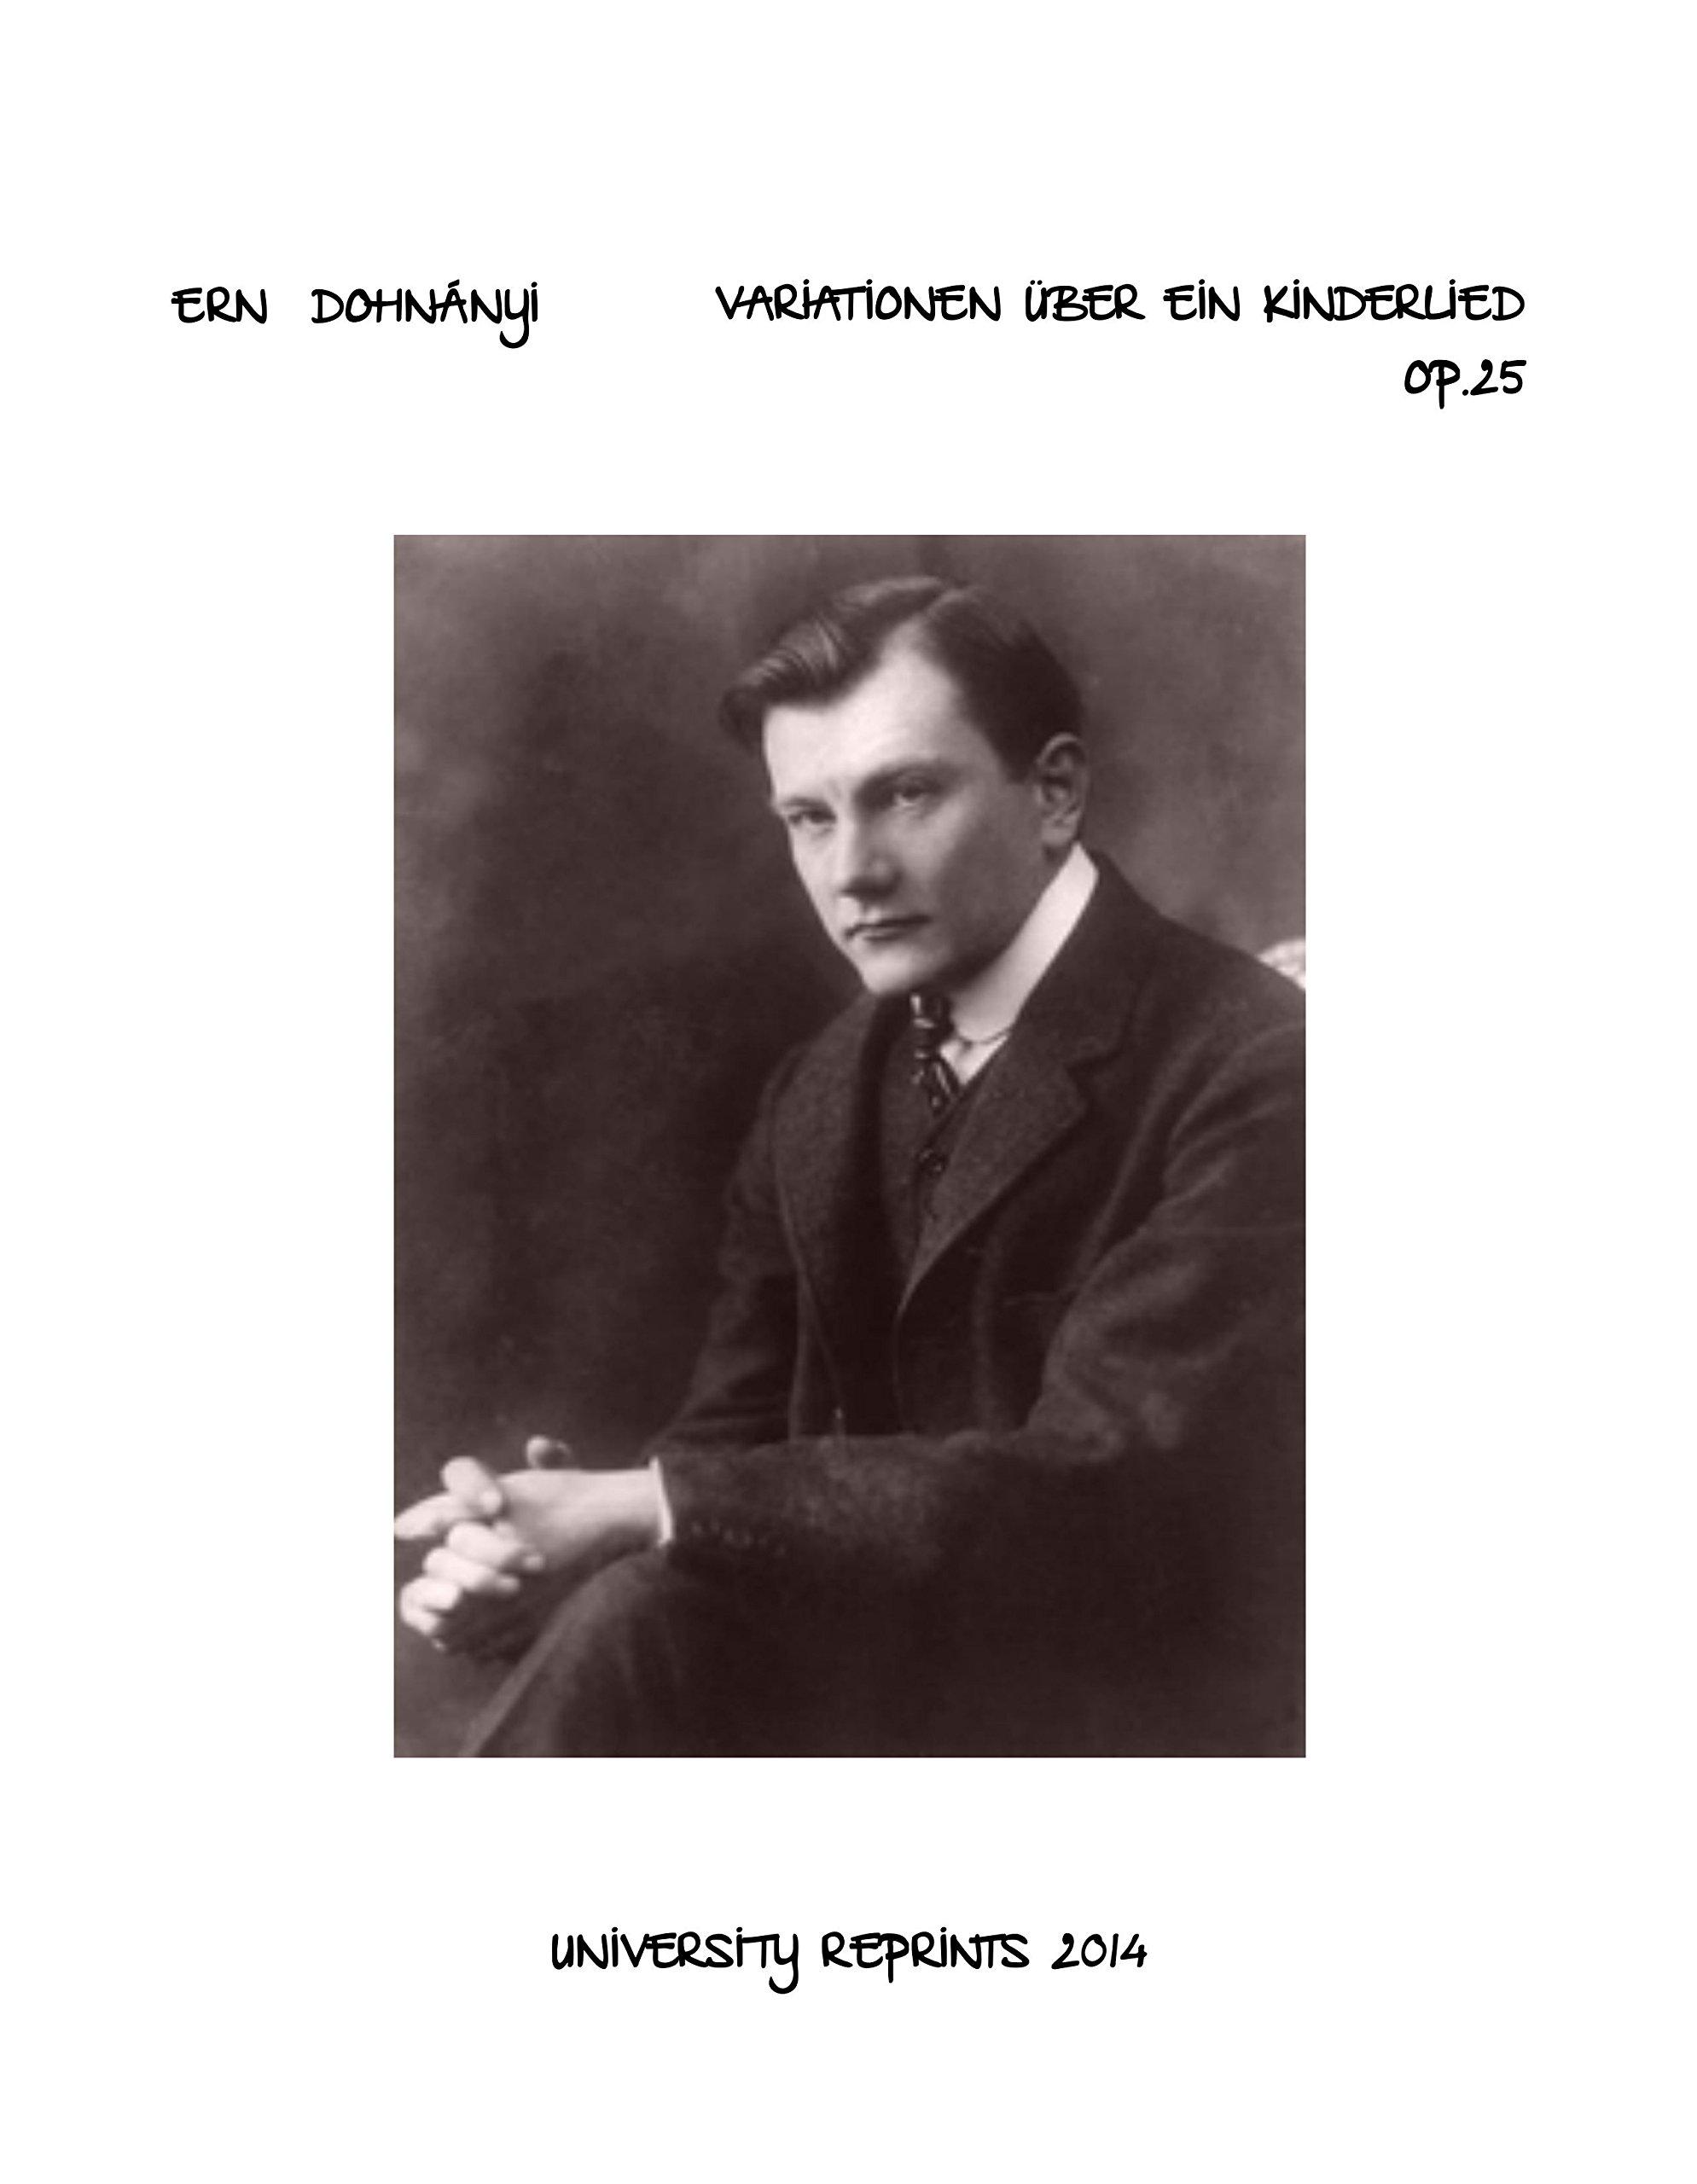 Download Variationen uber ein Kinderlied, Op.25 (Dohnanyi, Erno) COMPLETE [Re-Imaged from Original for Greater Clarity. Loose Leaf Facsimile.] ebook